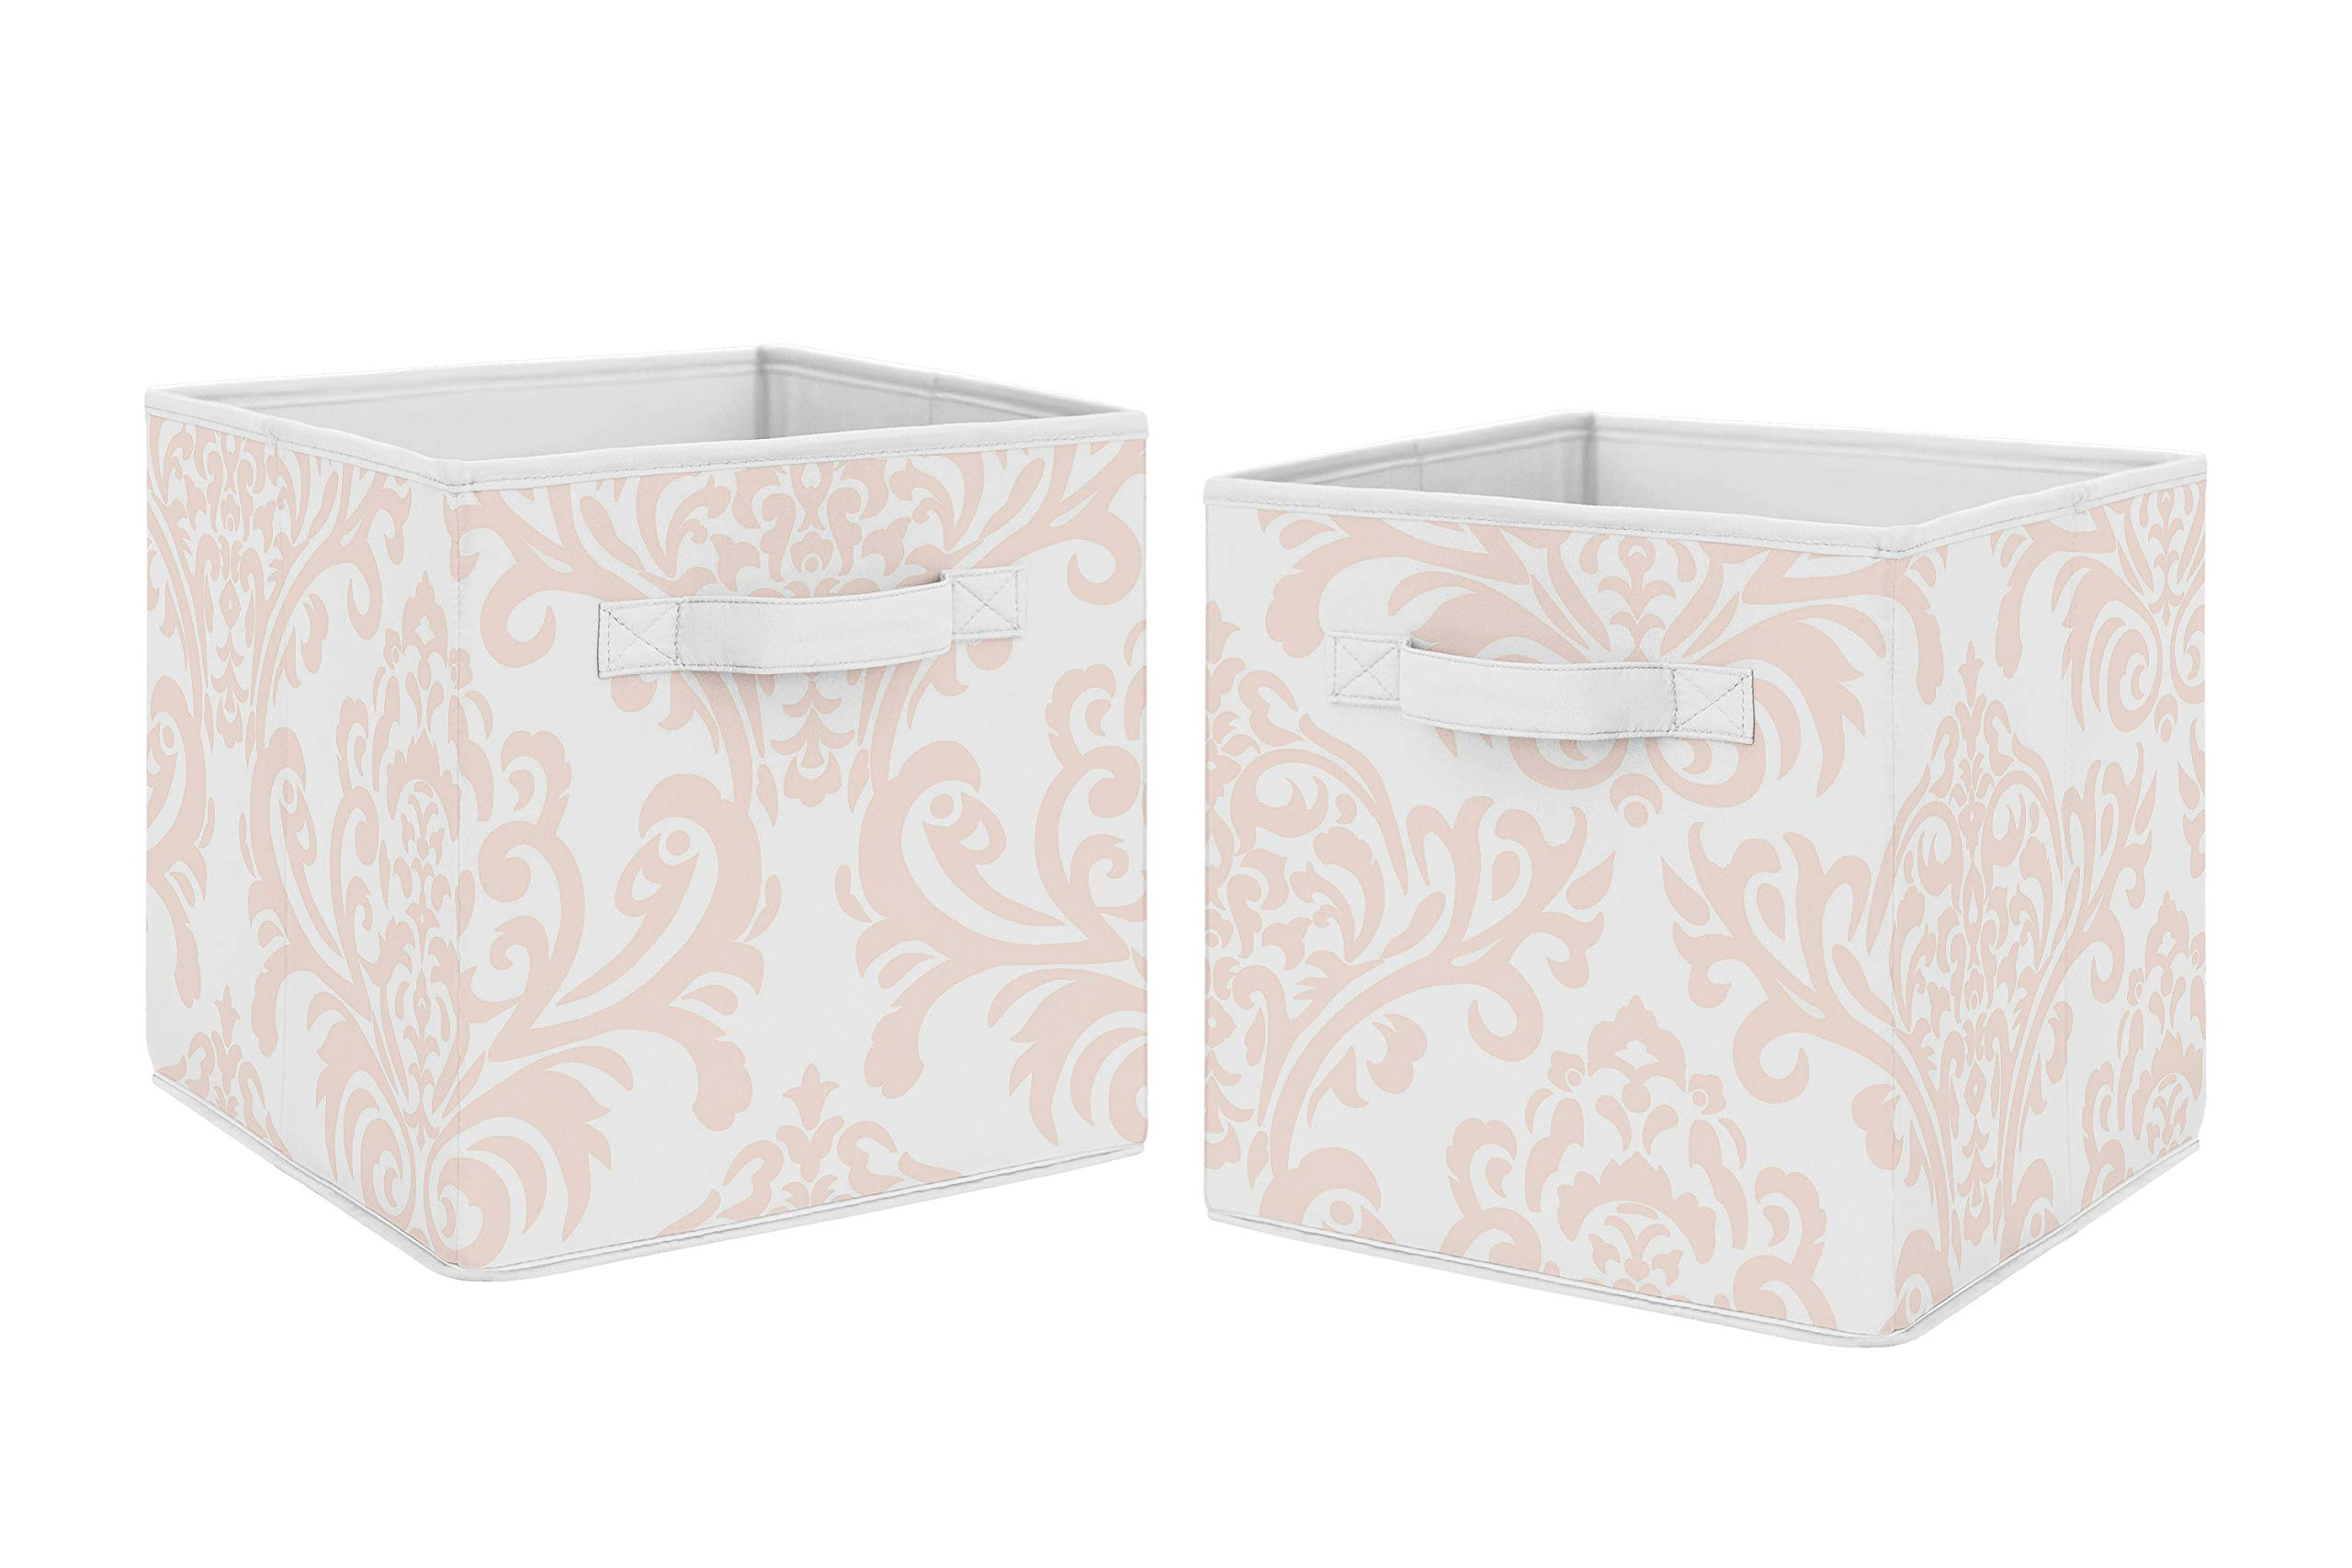 Sweet Jojo Designs Blush Pink and White Damask Organizer Storage Bins for Amelia Collection - Set of 2 by Sweet Jojo Designs